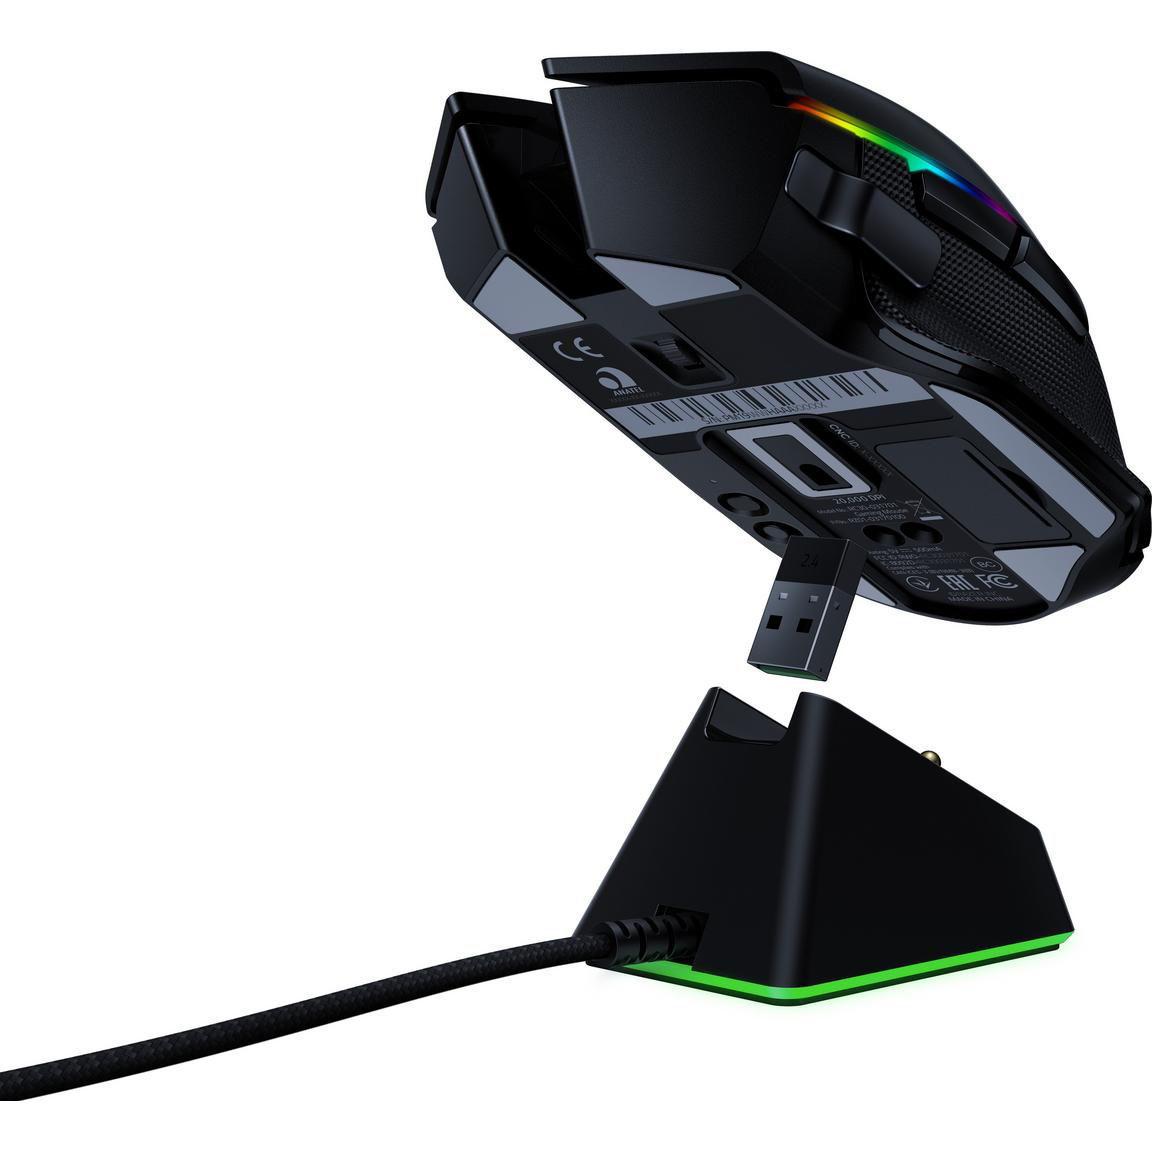 razer-basilisk-ultimate-wireless-gaming-mouse-with-charging-dock.jpg